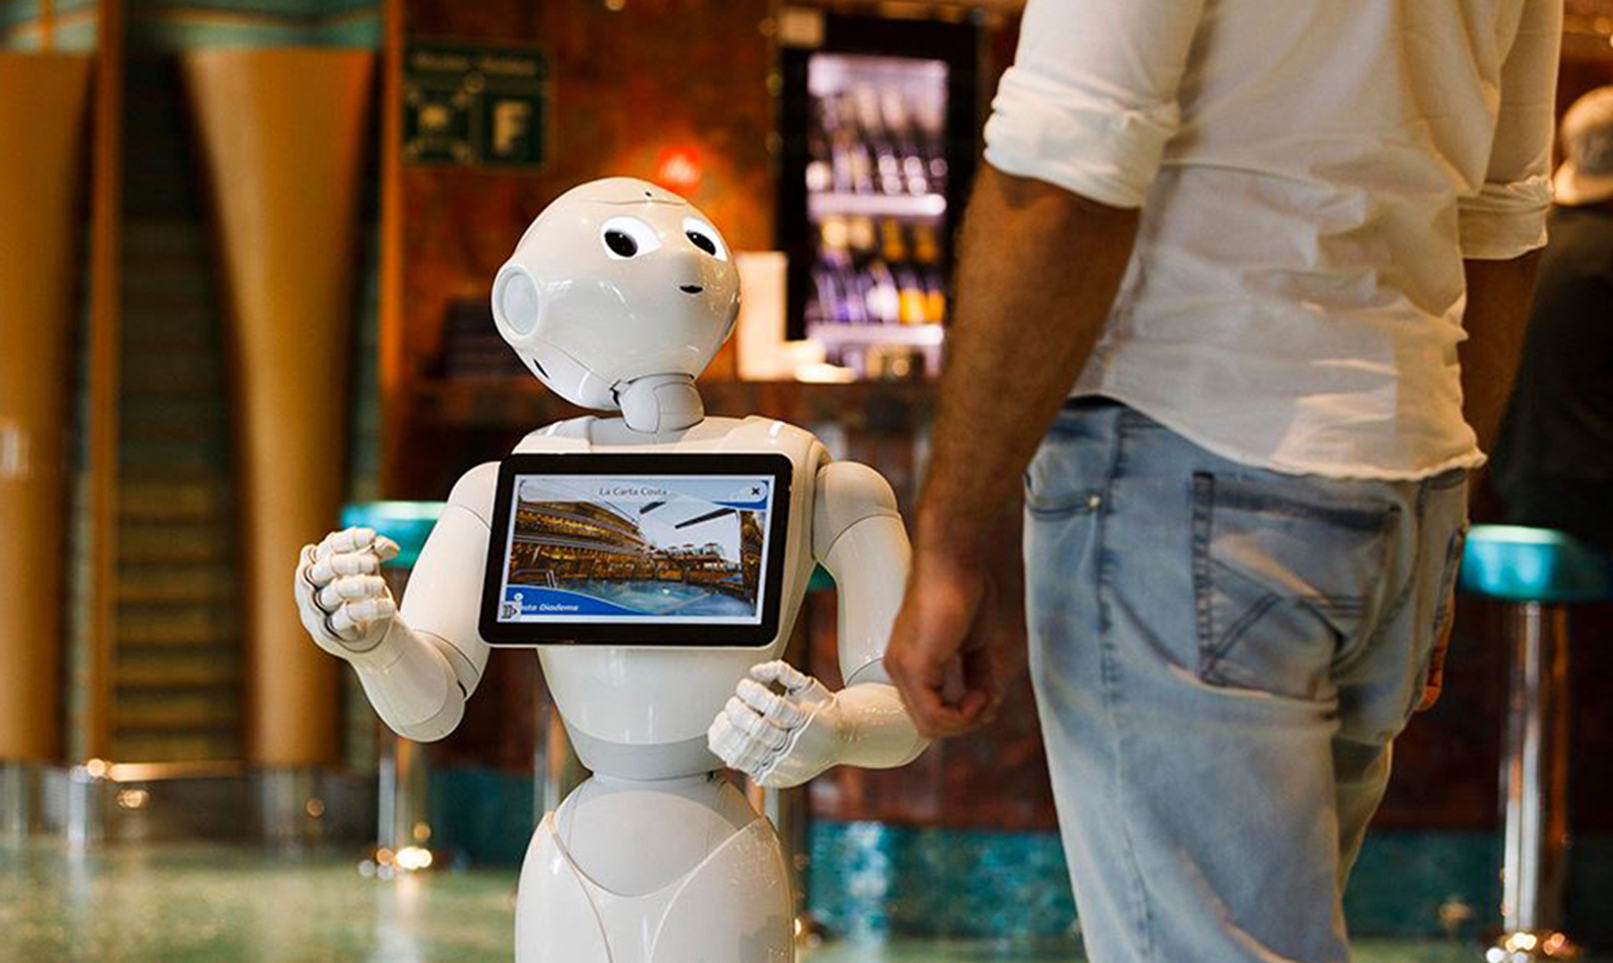 pepper intuitive robots home